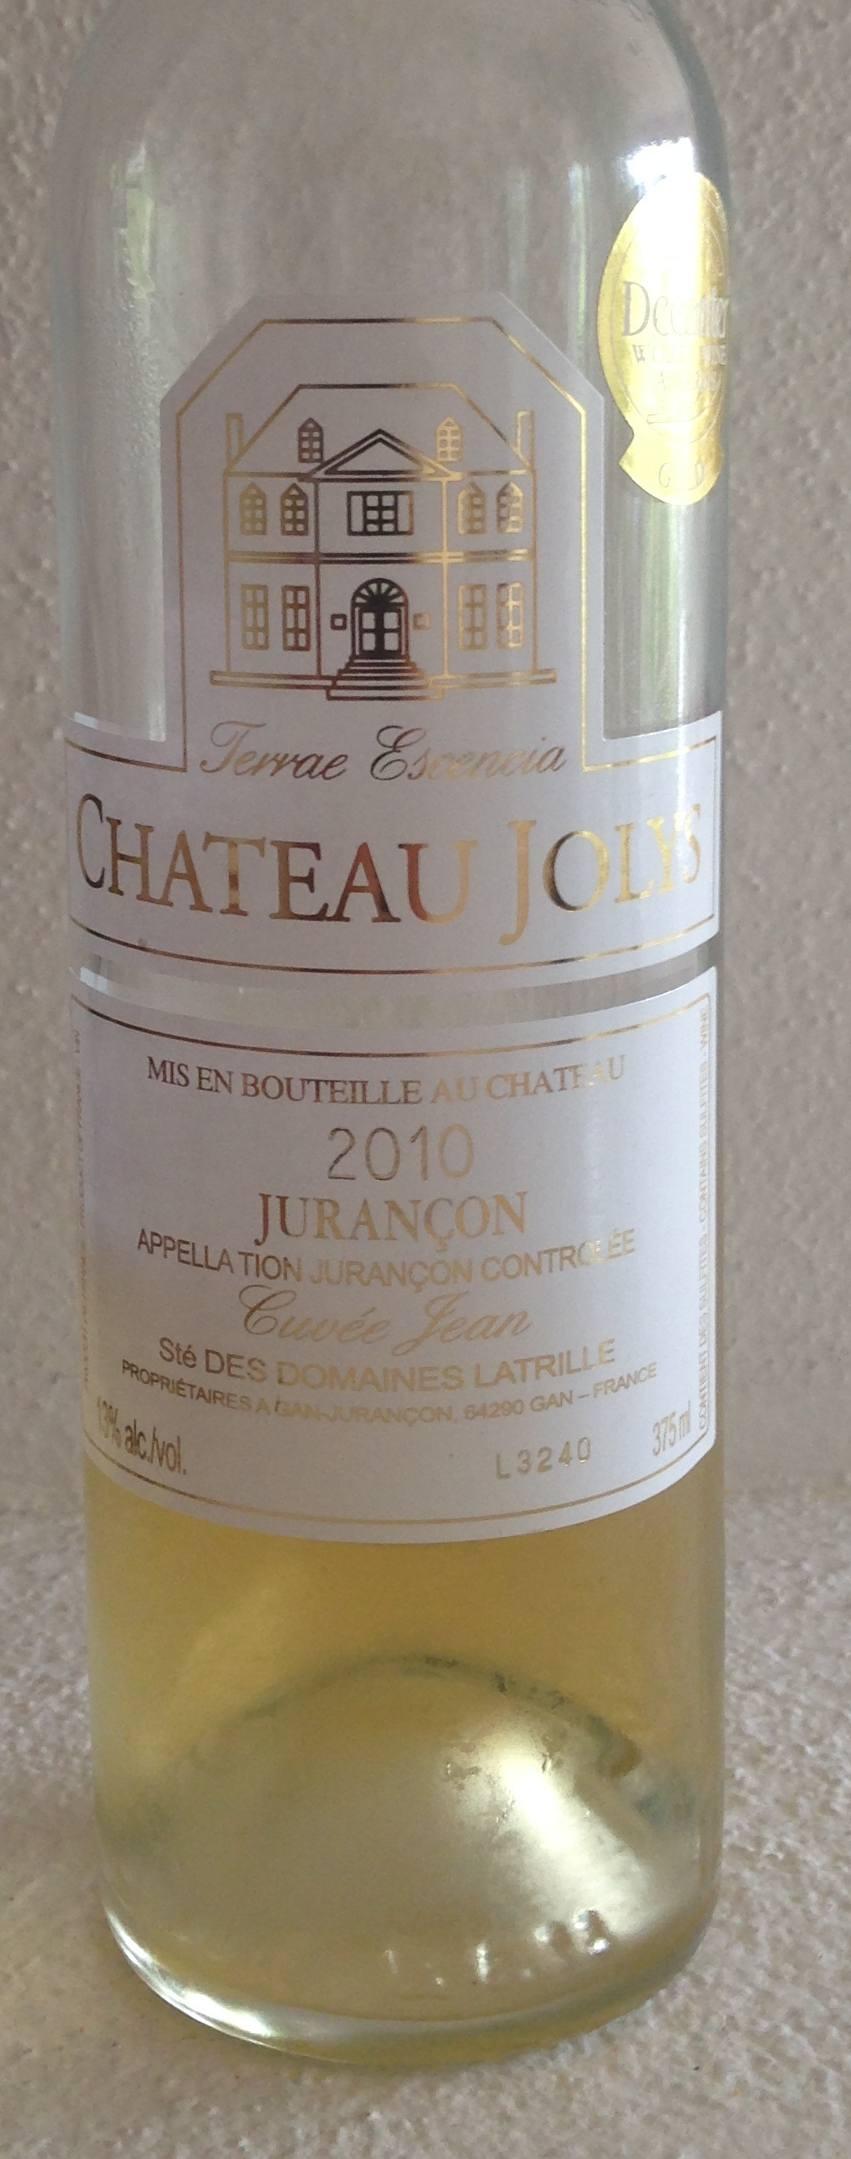 Jurancon Cuvee Jean 2010 Chateau Jolys